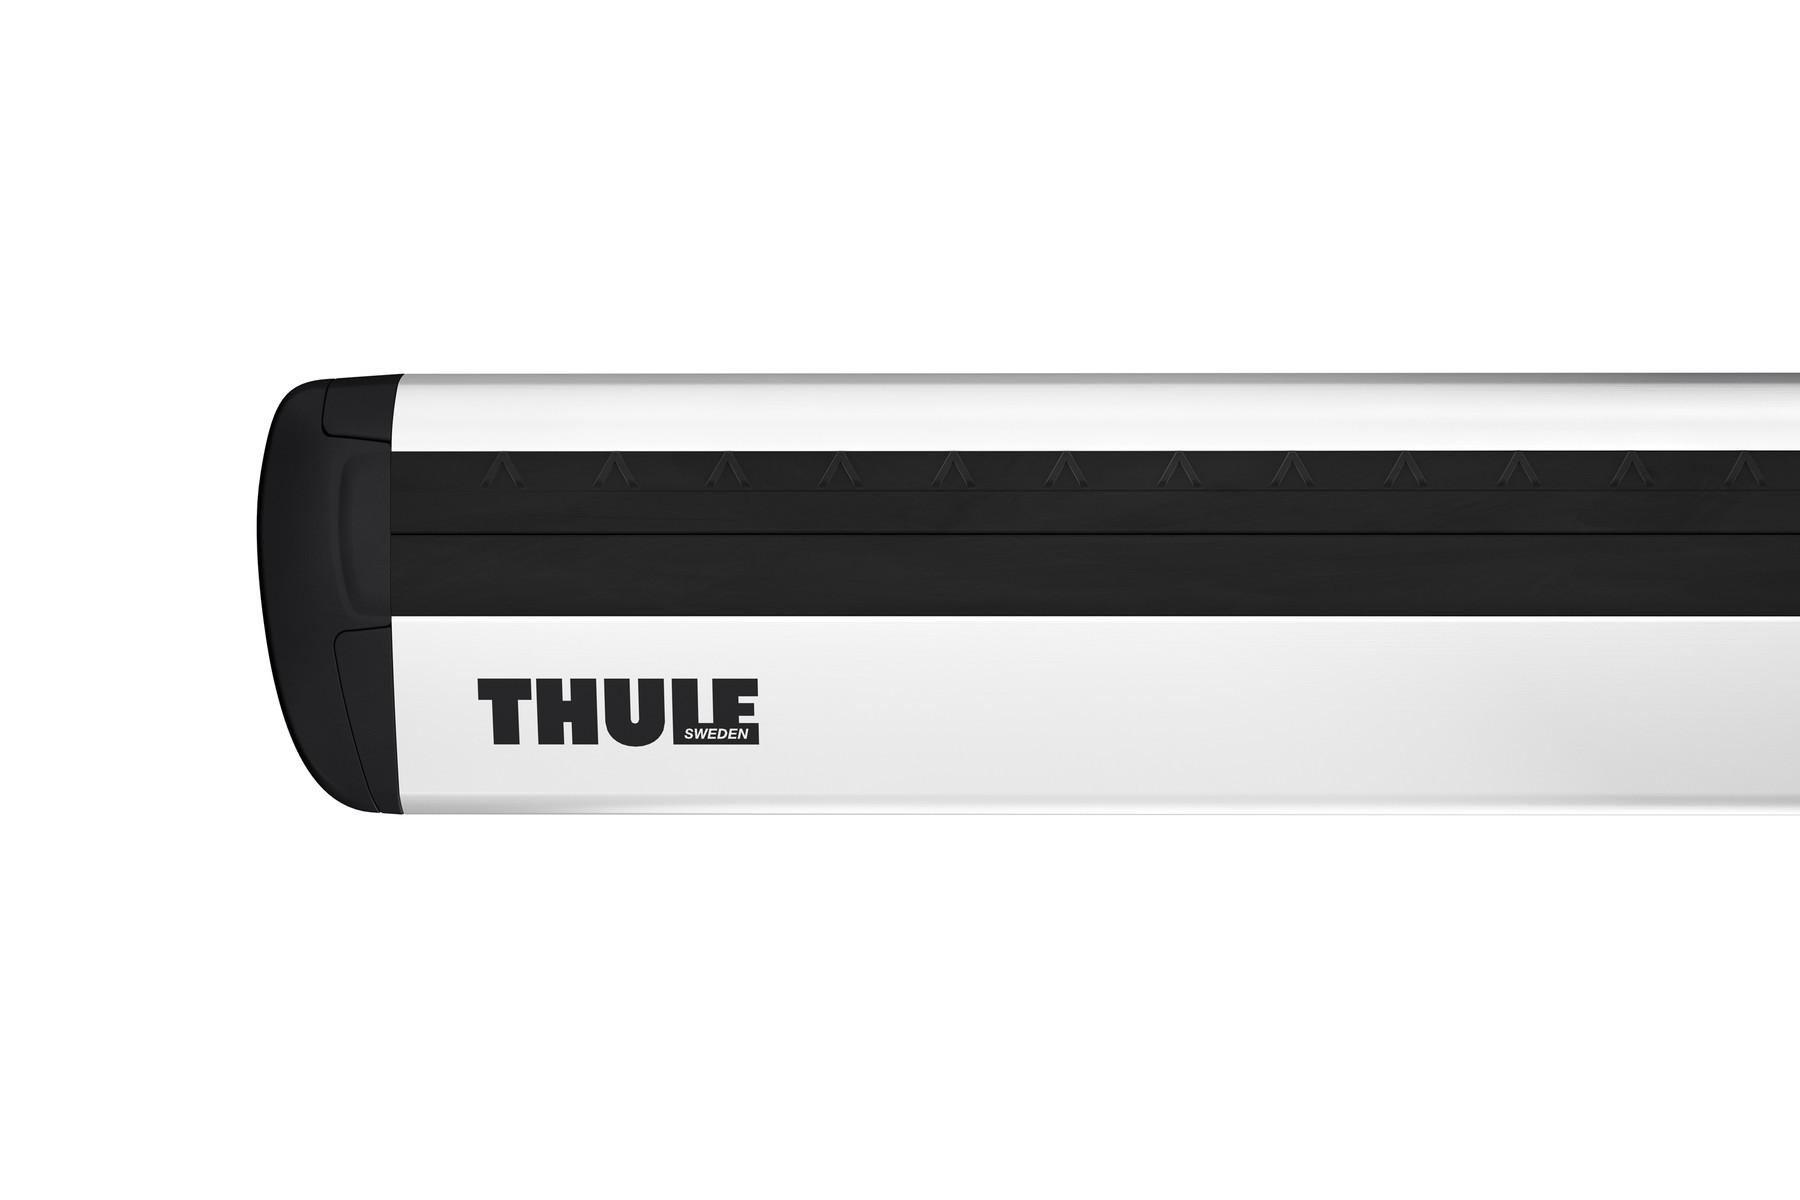 Barra Thule Aluminio WingBar Evo 118cm (7112) THULE 2 Barras